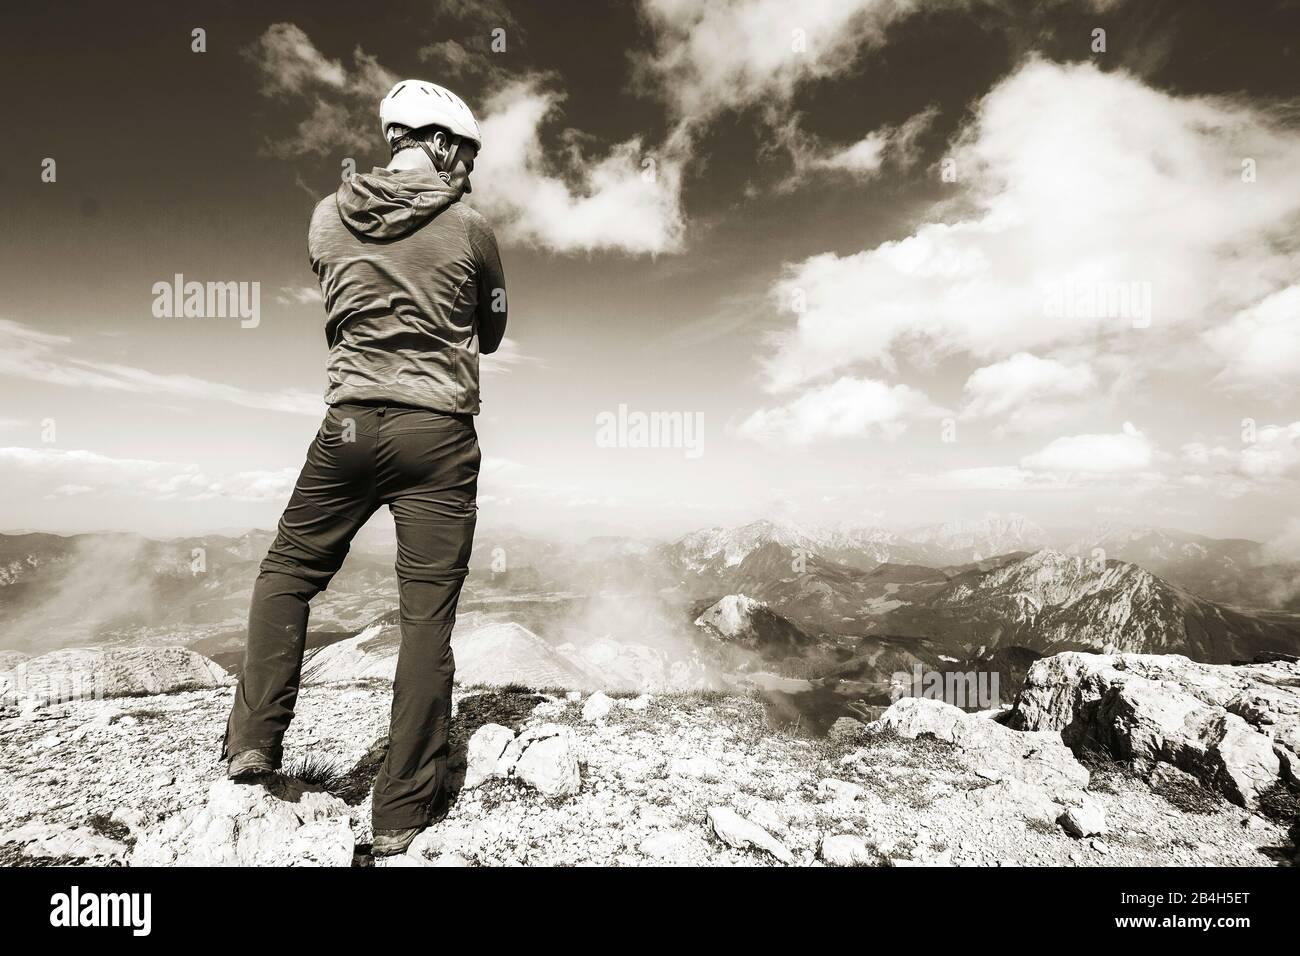 Warscheneck in the dead mountains Stock Photo